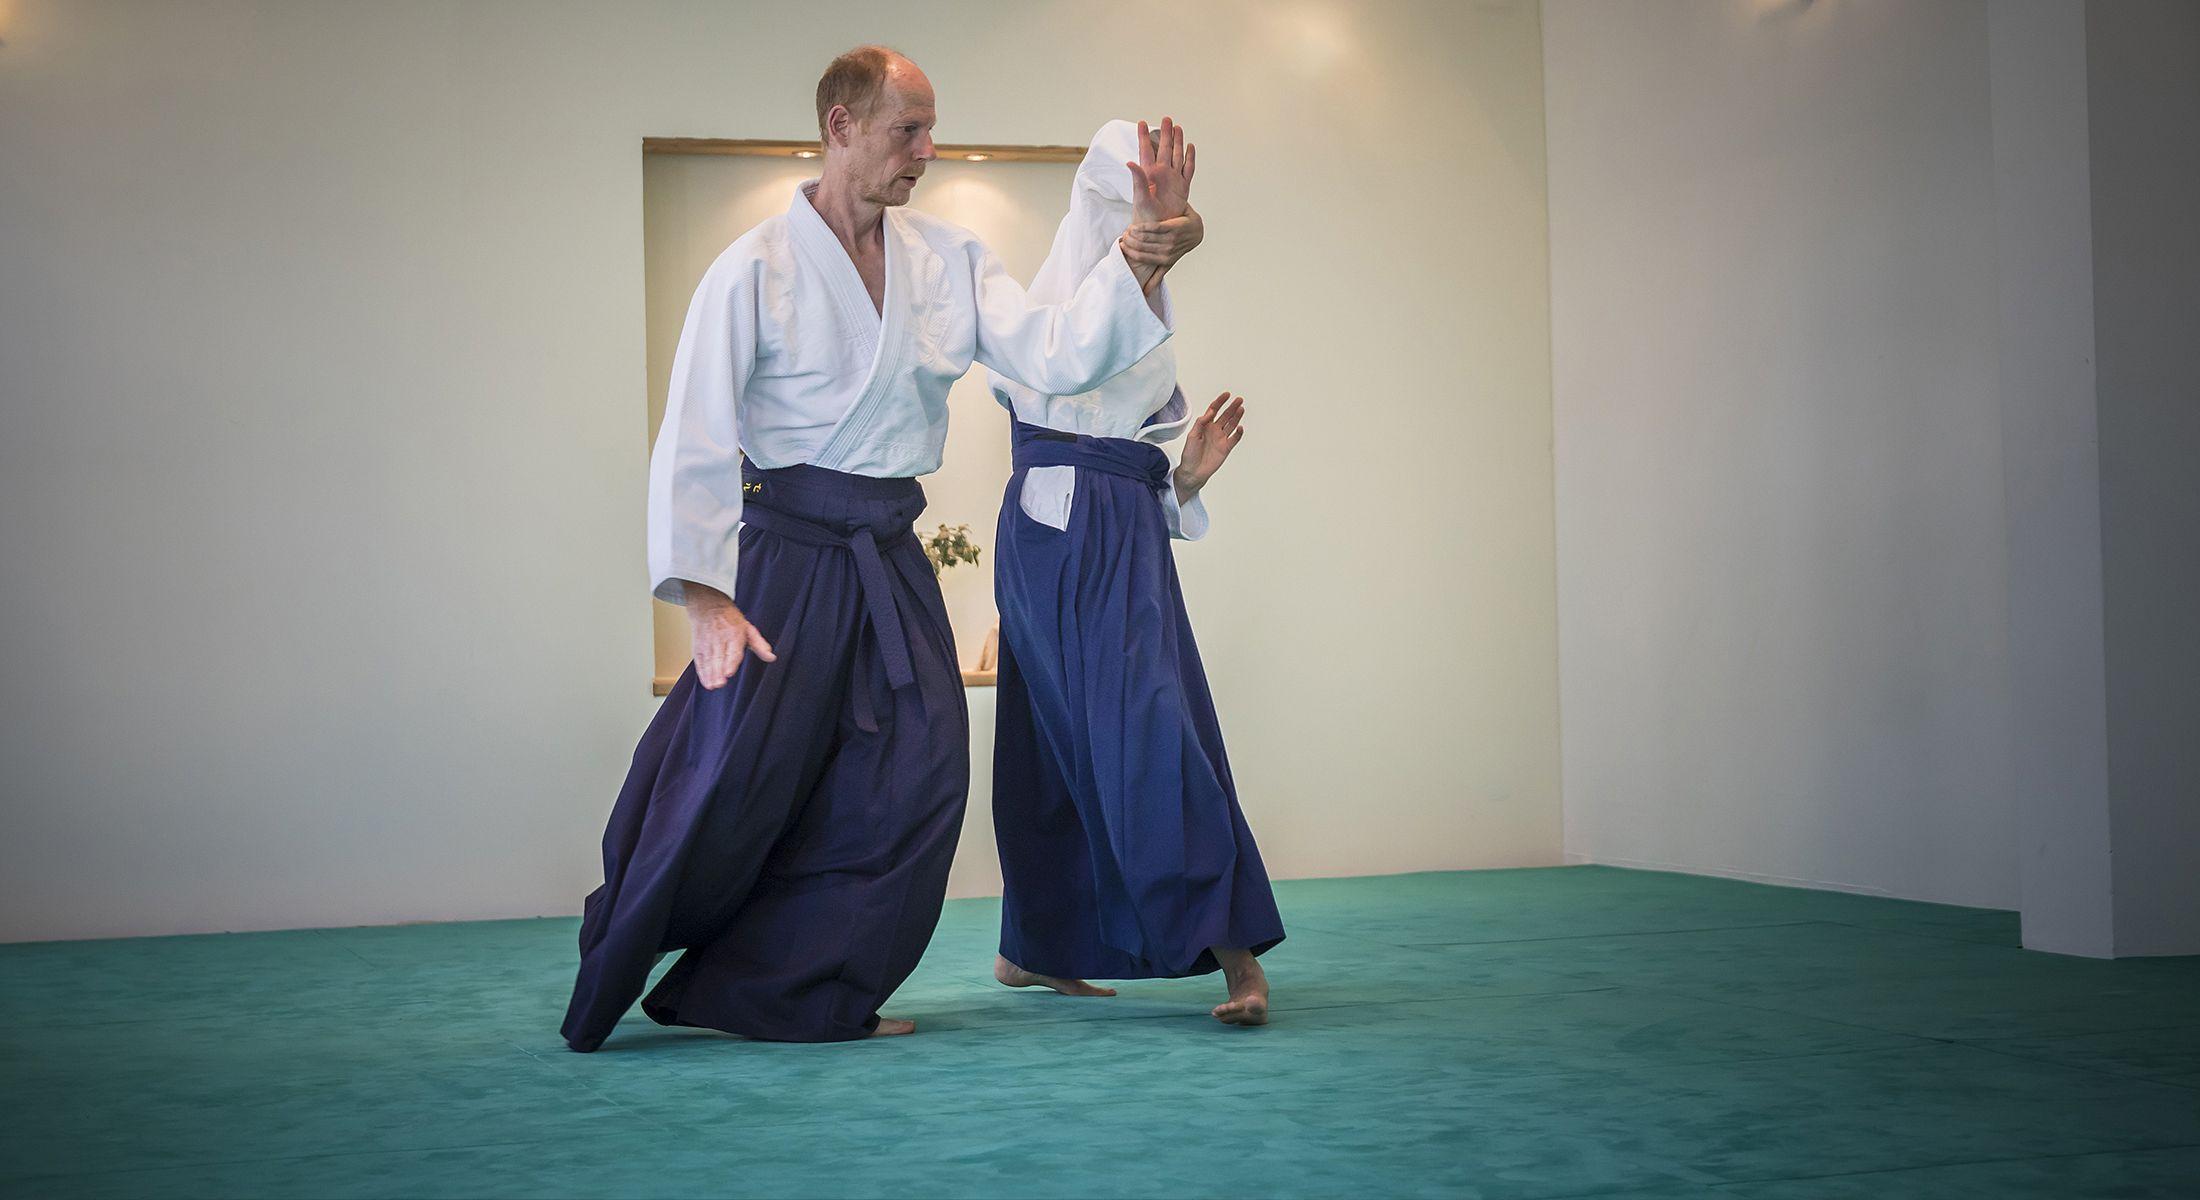 http://www.aikido-schule-bielefeld.de/wp-content/uploads/2018/12/slider04_1.jpg